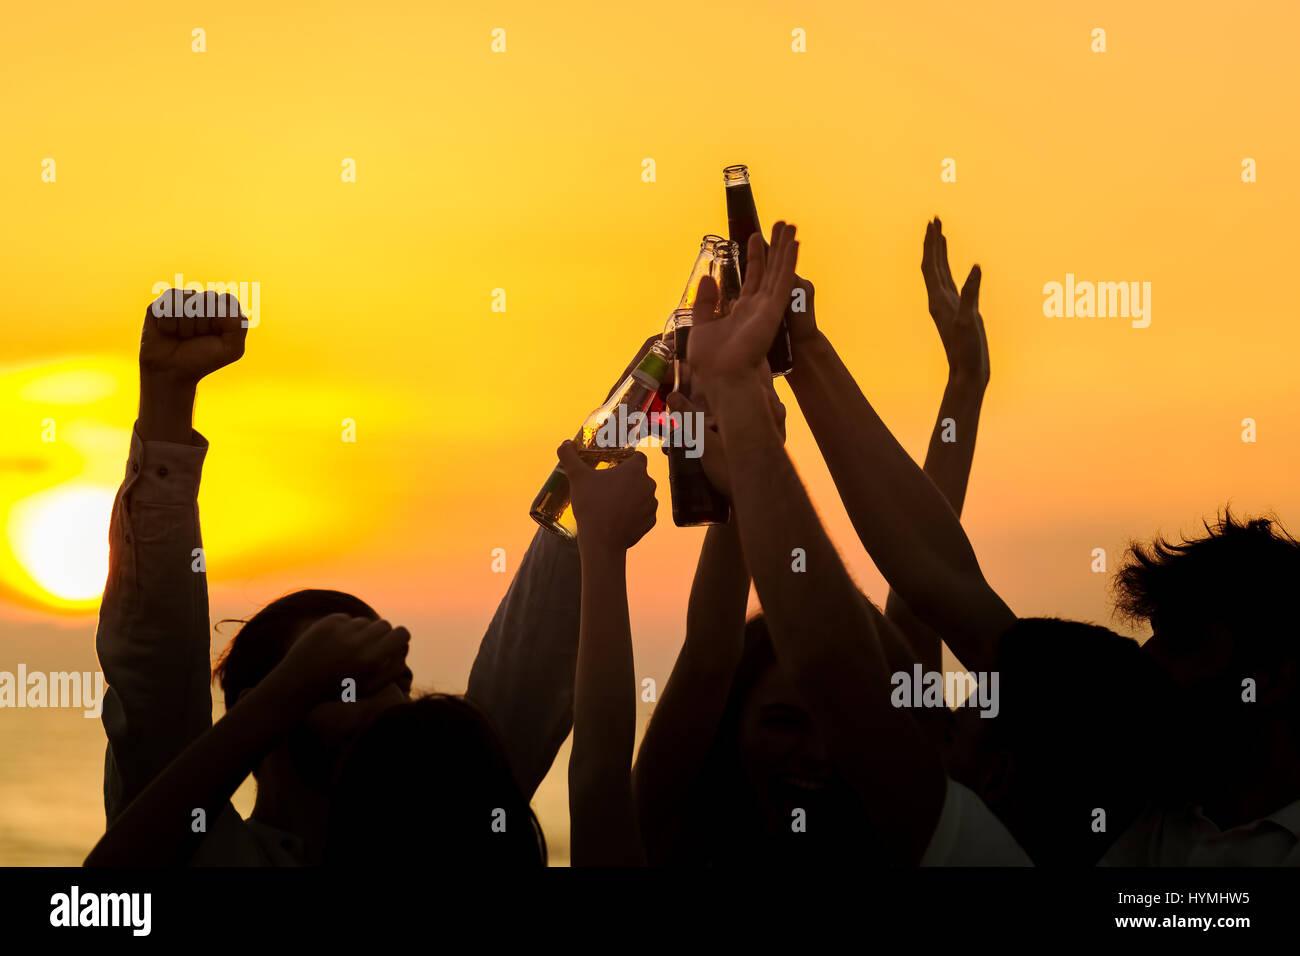 Freunde-Beach Party Getränke Toast Feier Konzept Stockfoto, Bild ...